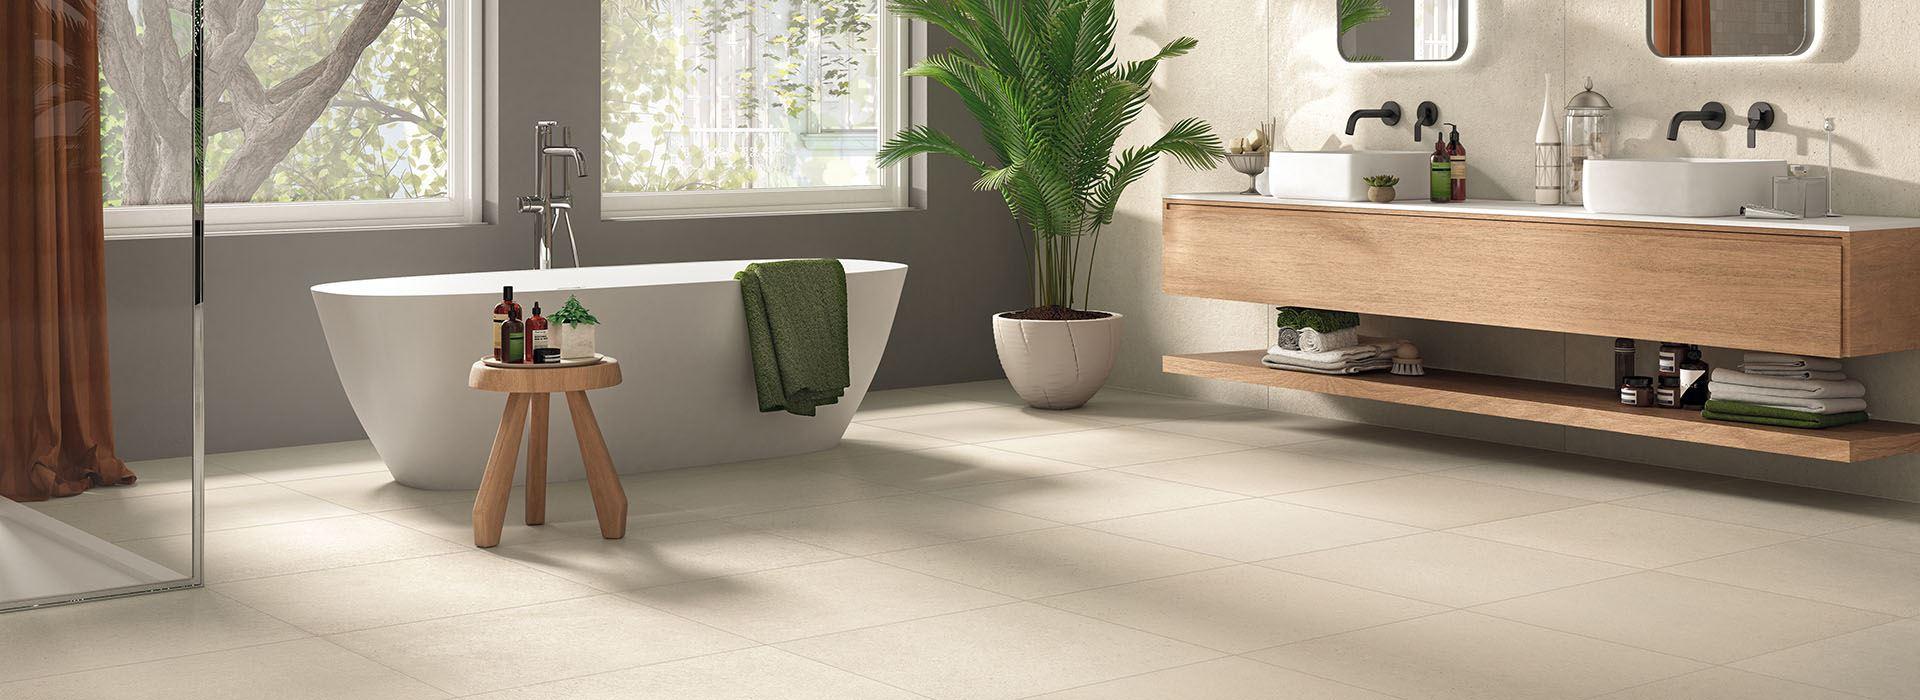 Context Collection Panaria Flooring And Cladding